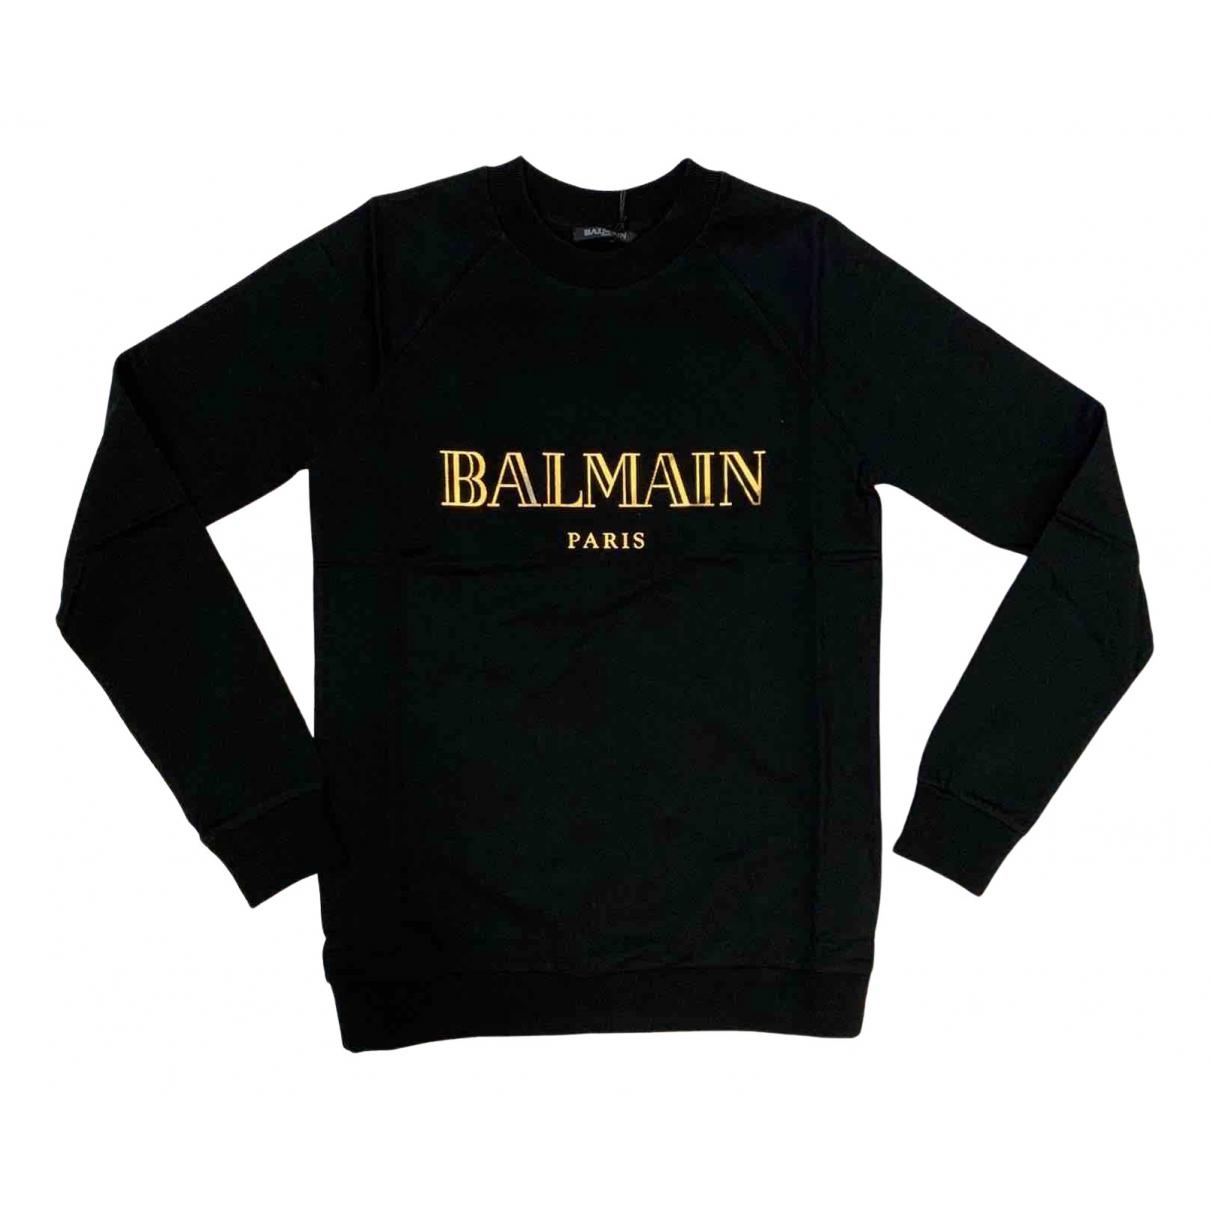 Balmain N Black Cotton Knitwear for Women 38 FR